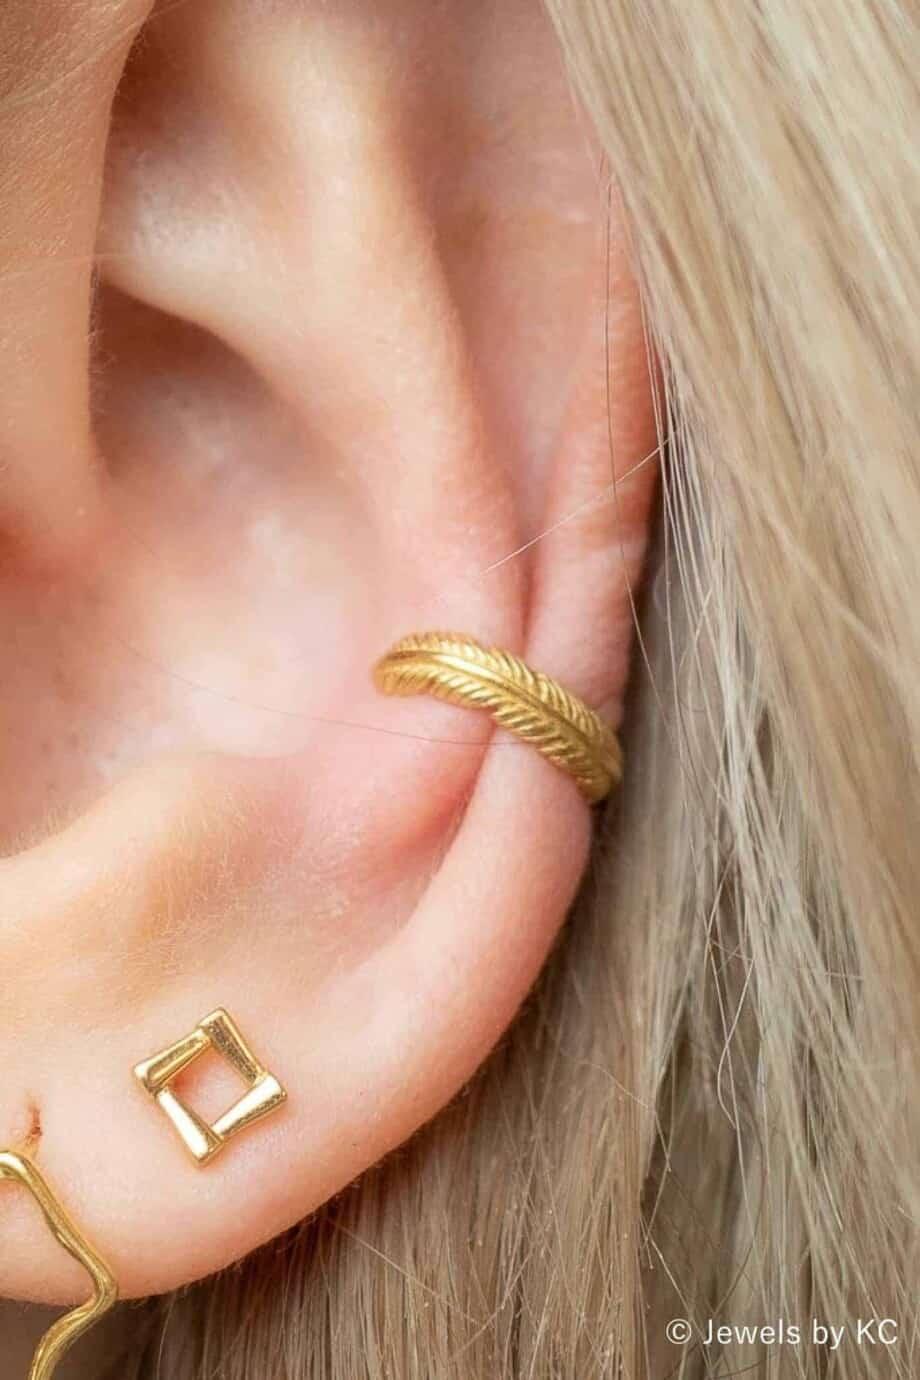 Gouden ear cuff 'Long feather' van Goud op Zilver